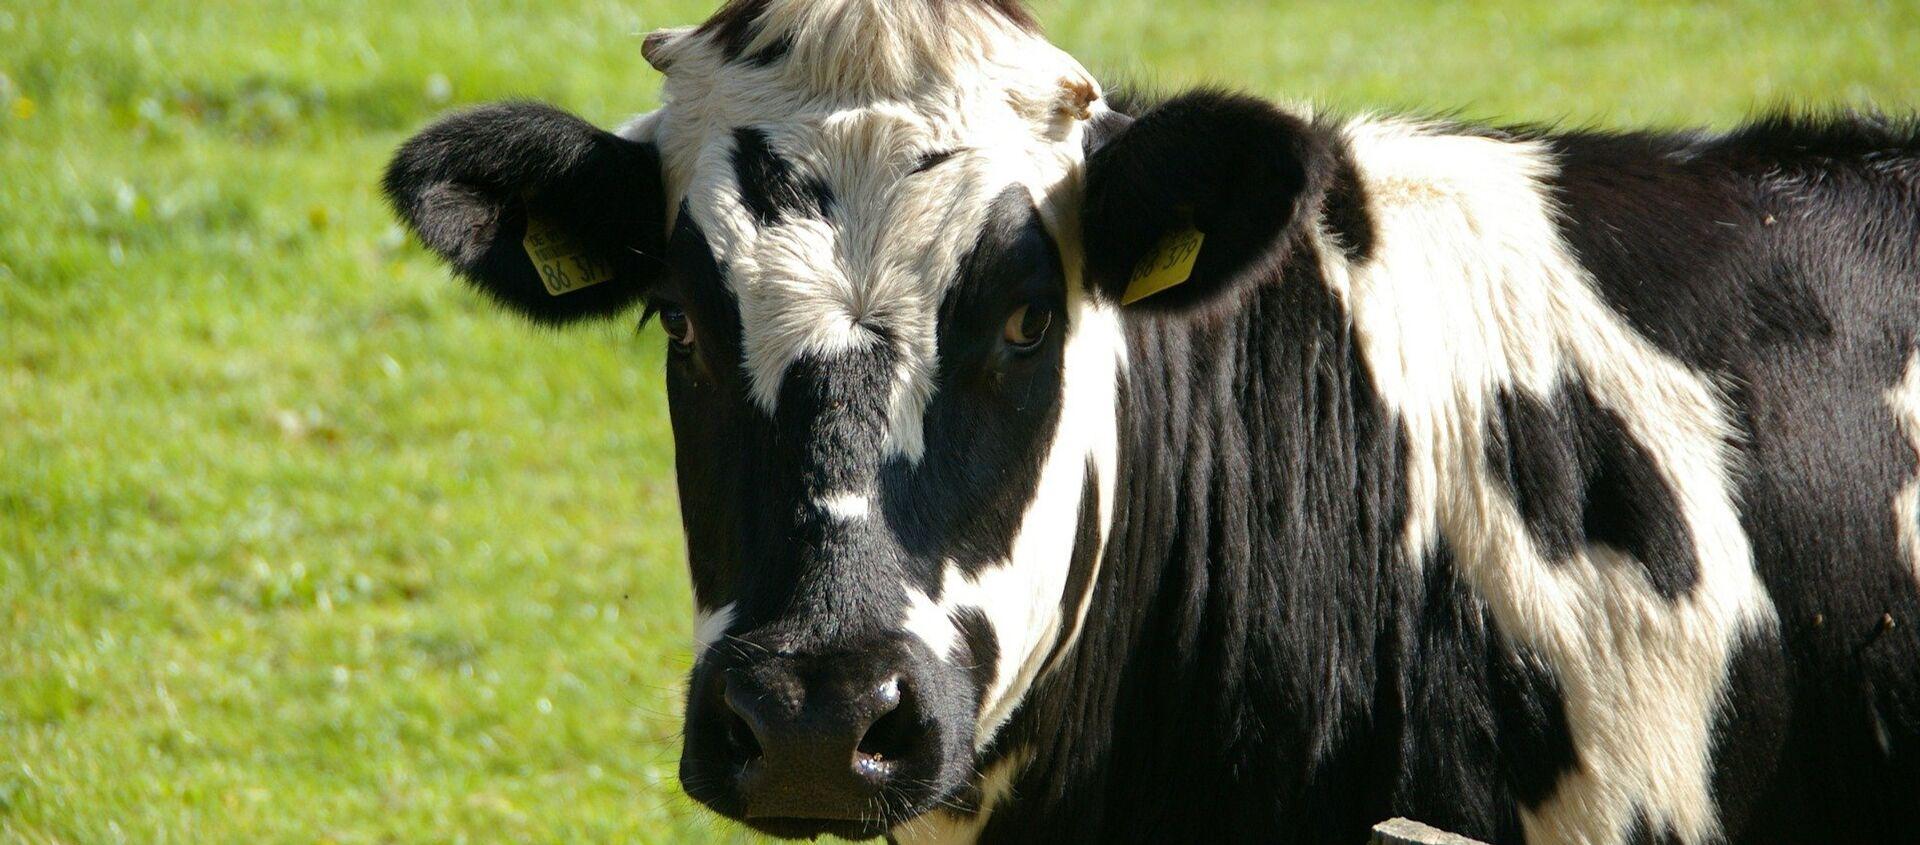 Una vaca (archivo) - Sputnik Mundo, 1920, 31.05.2019